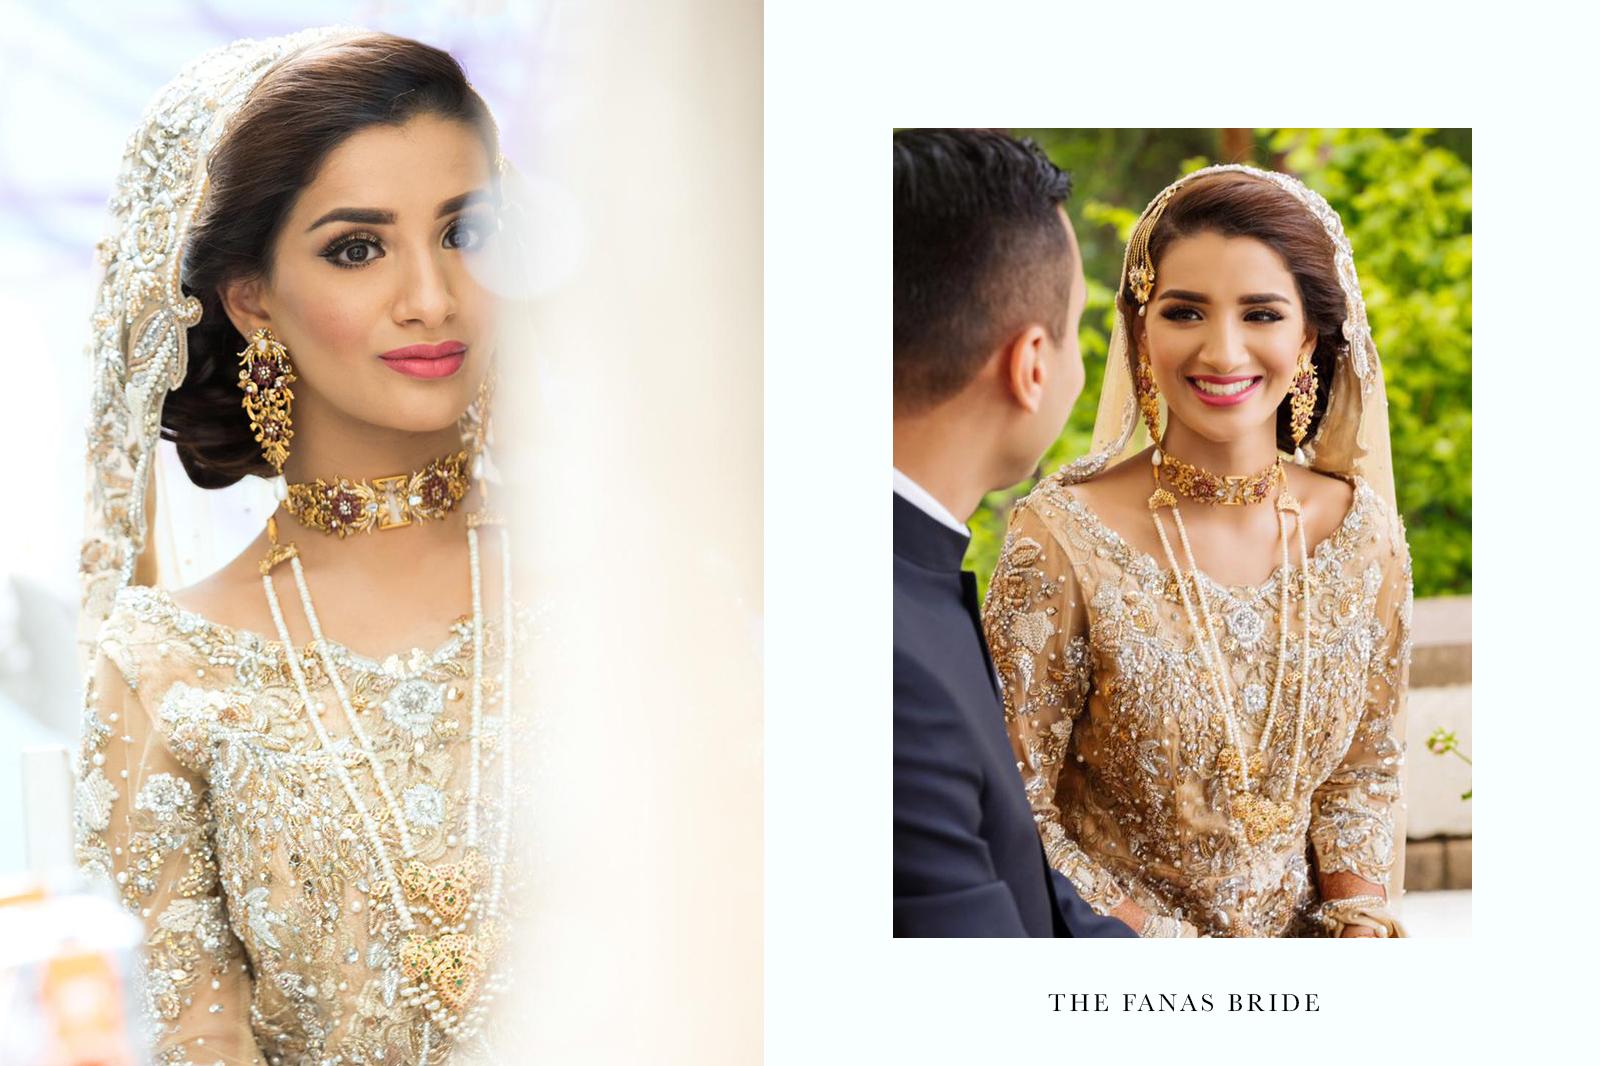 Fanas jewellery bespoke bridal beautiful traditional wedding collection Women Gold plating fine jewllery handmade earrings set rubies zircons Fashion Pakistan Lahore